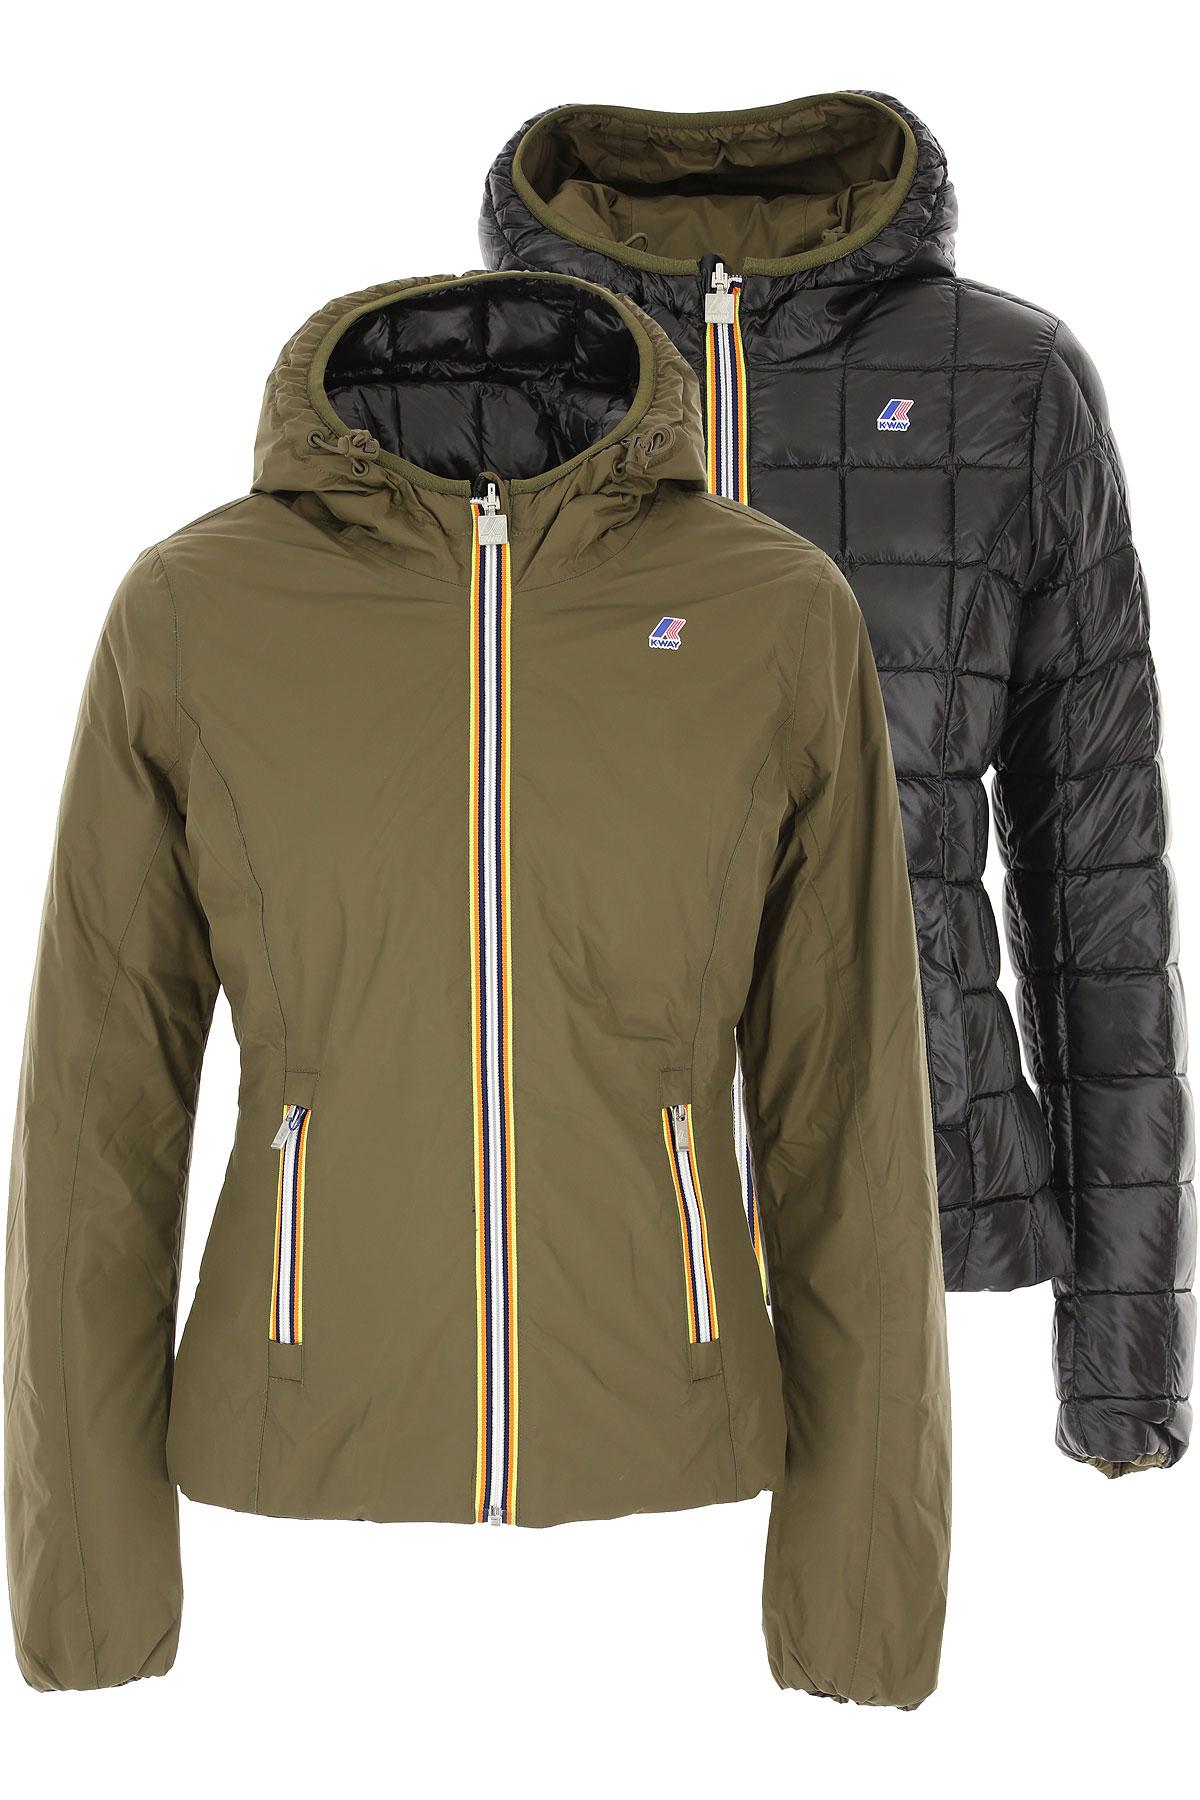 K-Way Down Jacket for Women, Puffer Ski Jacket On Sale, Military Green, polyamide, 2019, 40 44